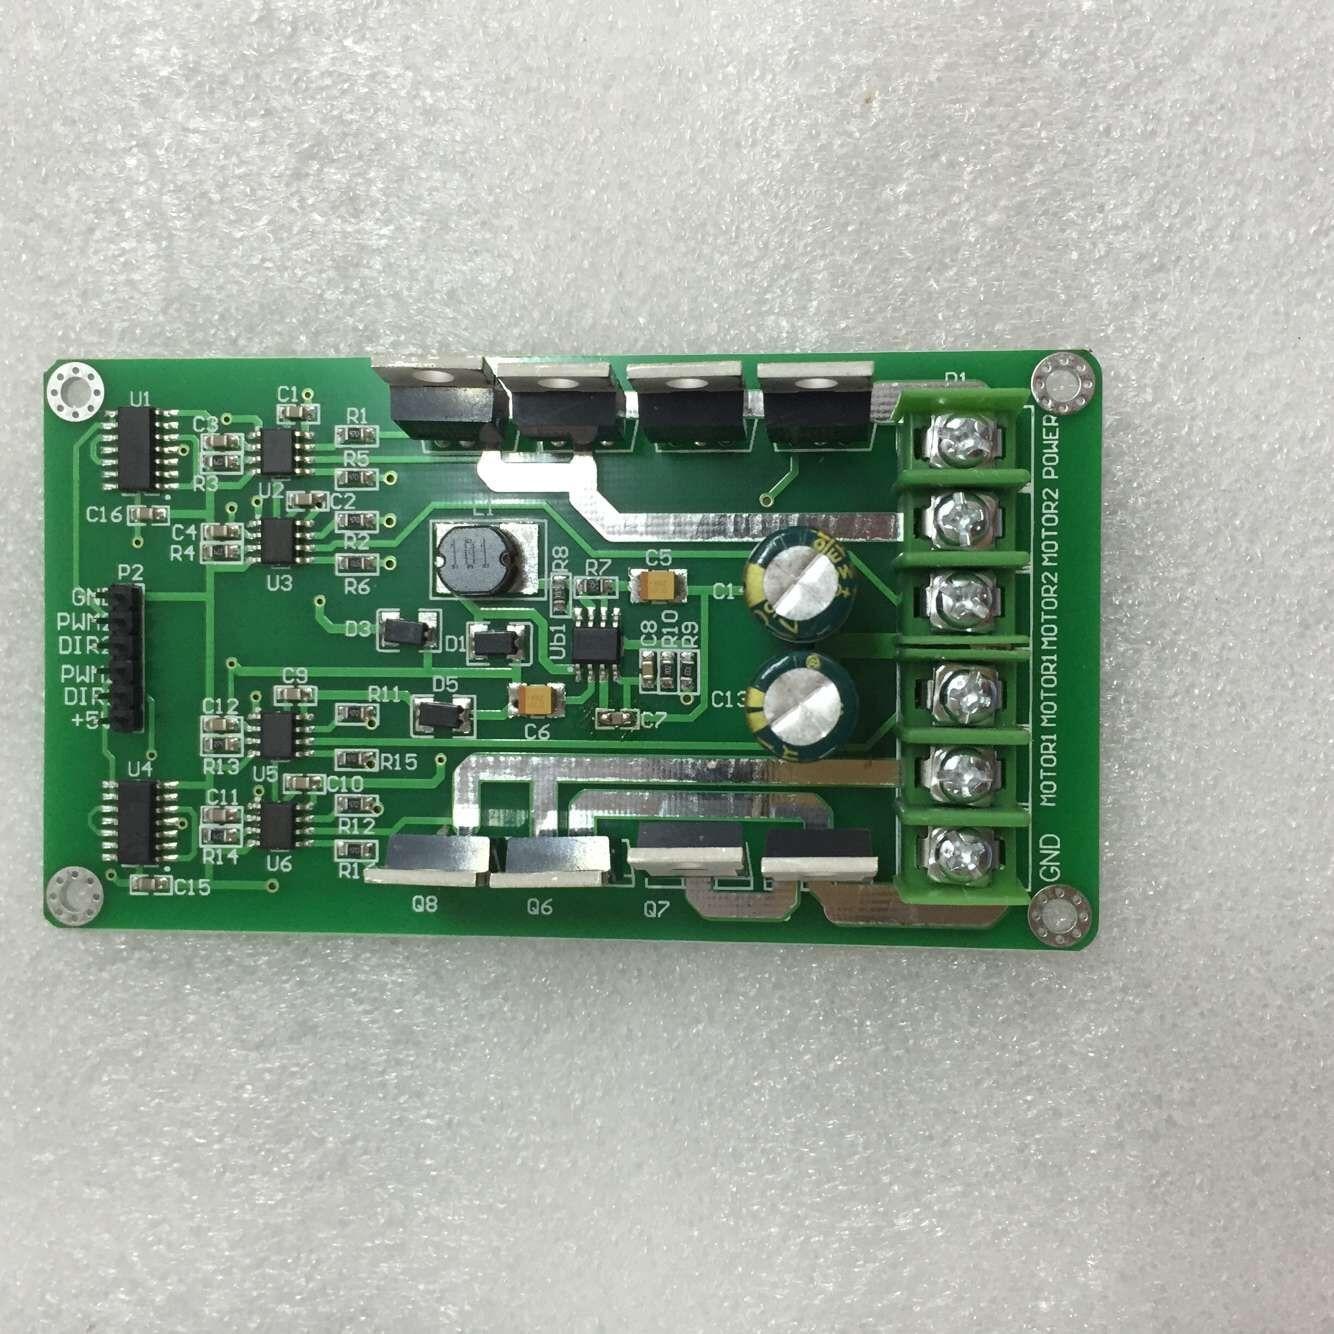 10A Double Motor Drive Module, High Power H Bridge, Powerful Braking Function, DC Motor Drive Board aurora double drive 1500